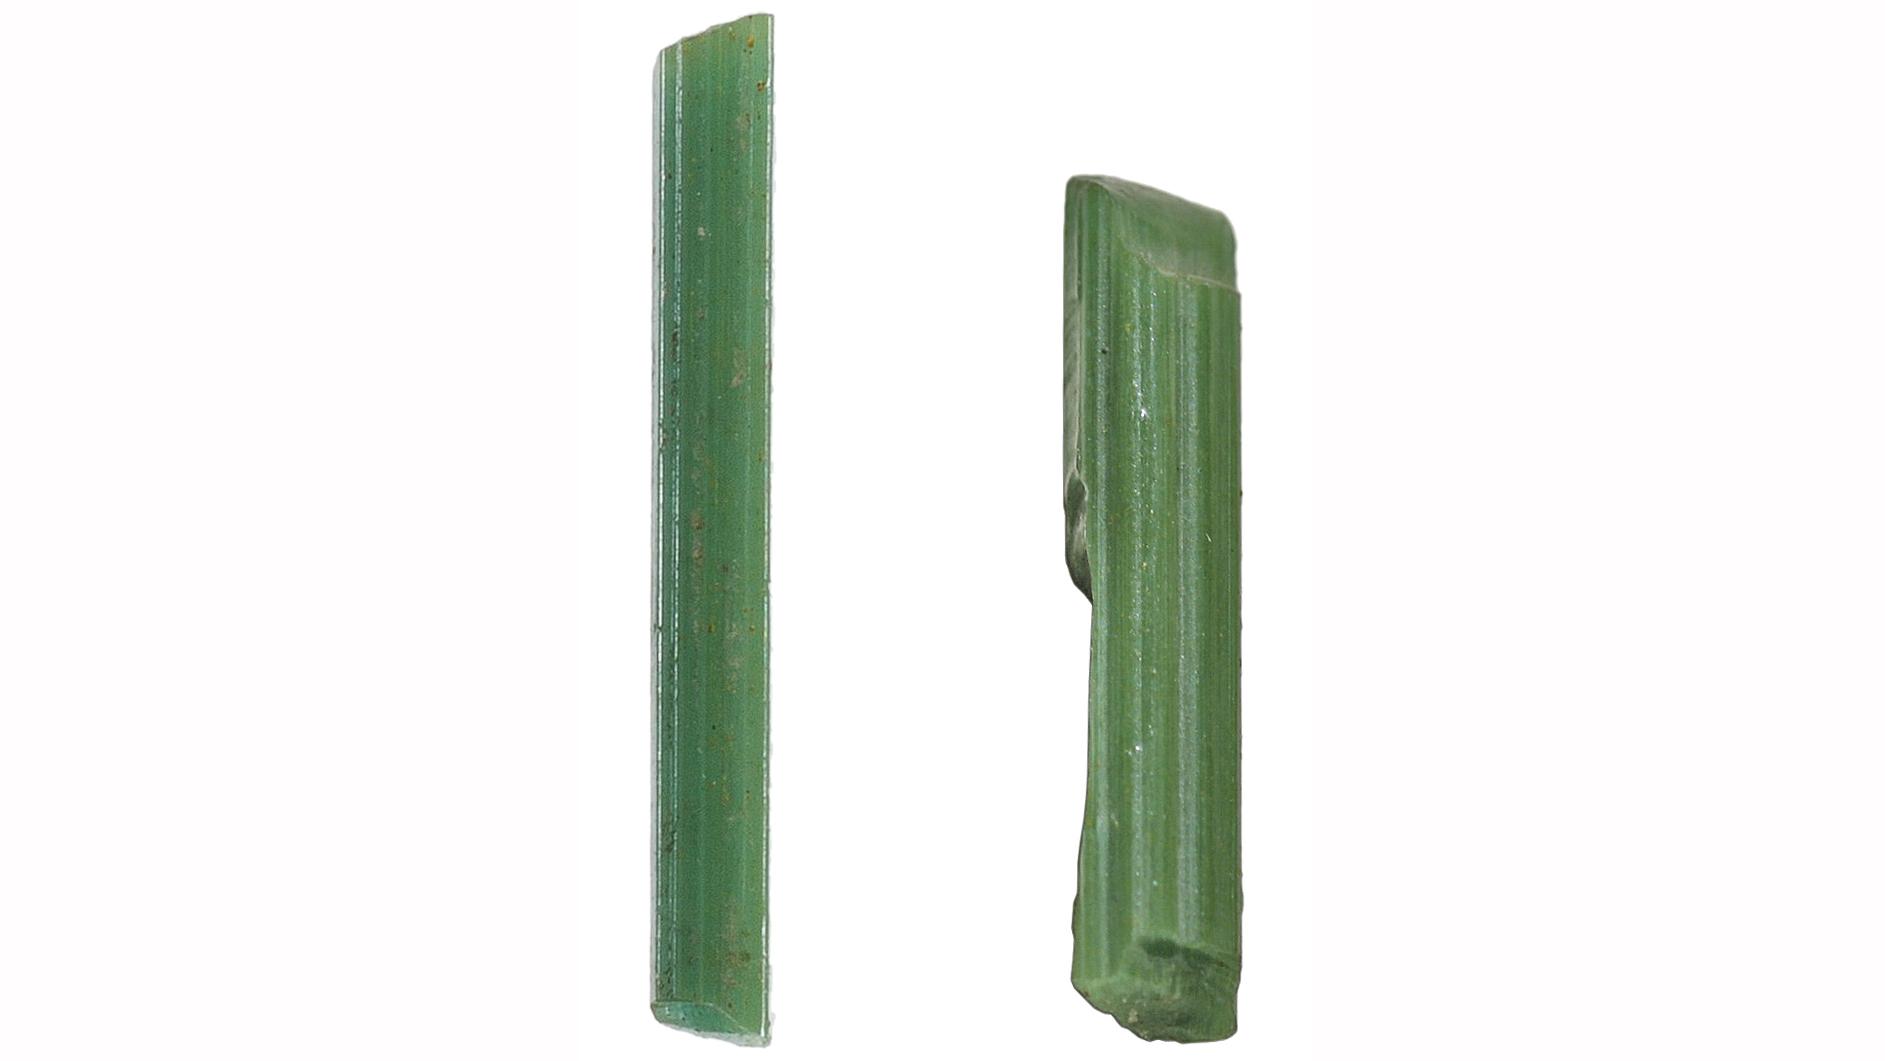 Glas stave fra Armana, Egypten, fire gange naturlig størrelse